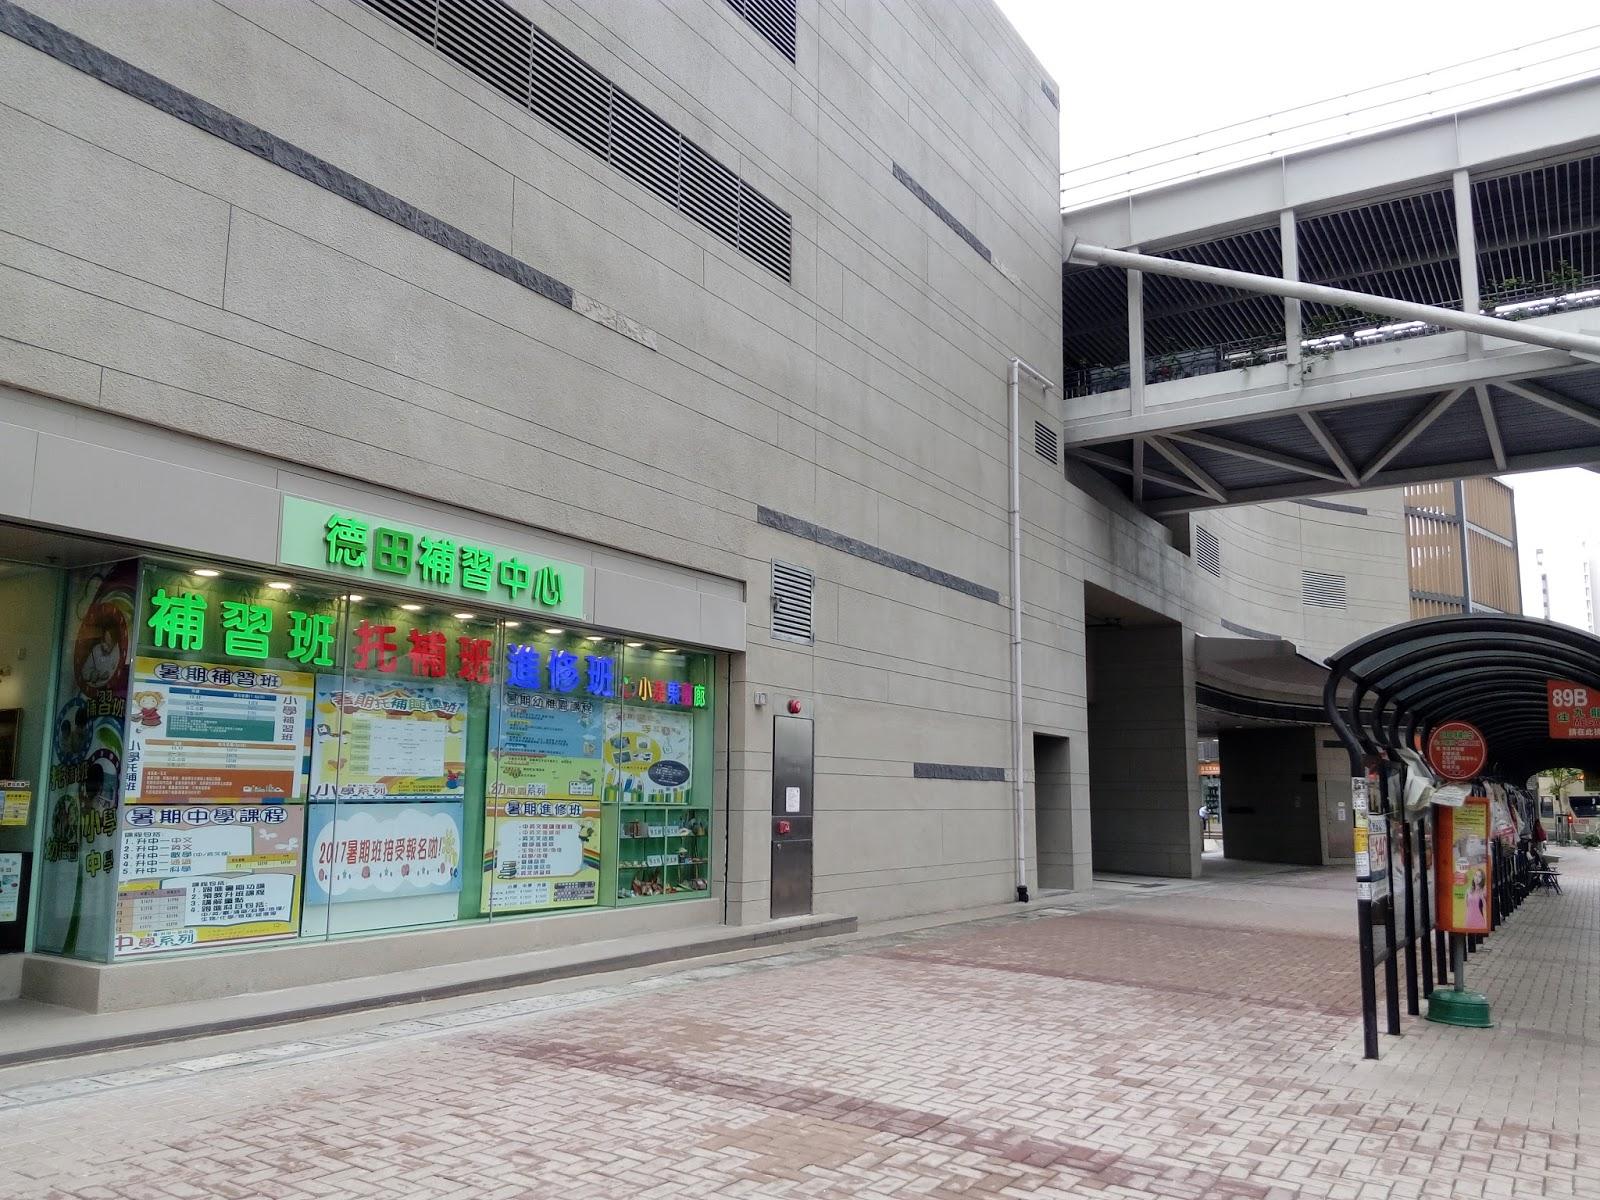 Grassroots O2: [房署商場] 安達商場 @2017-05-13